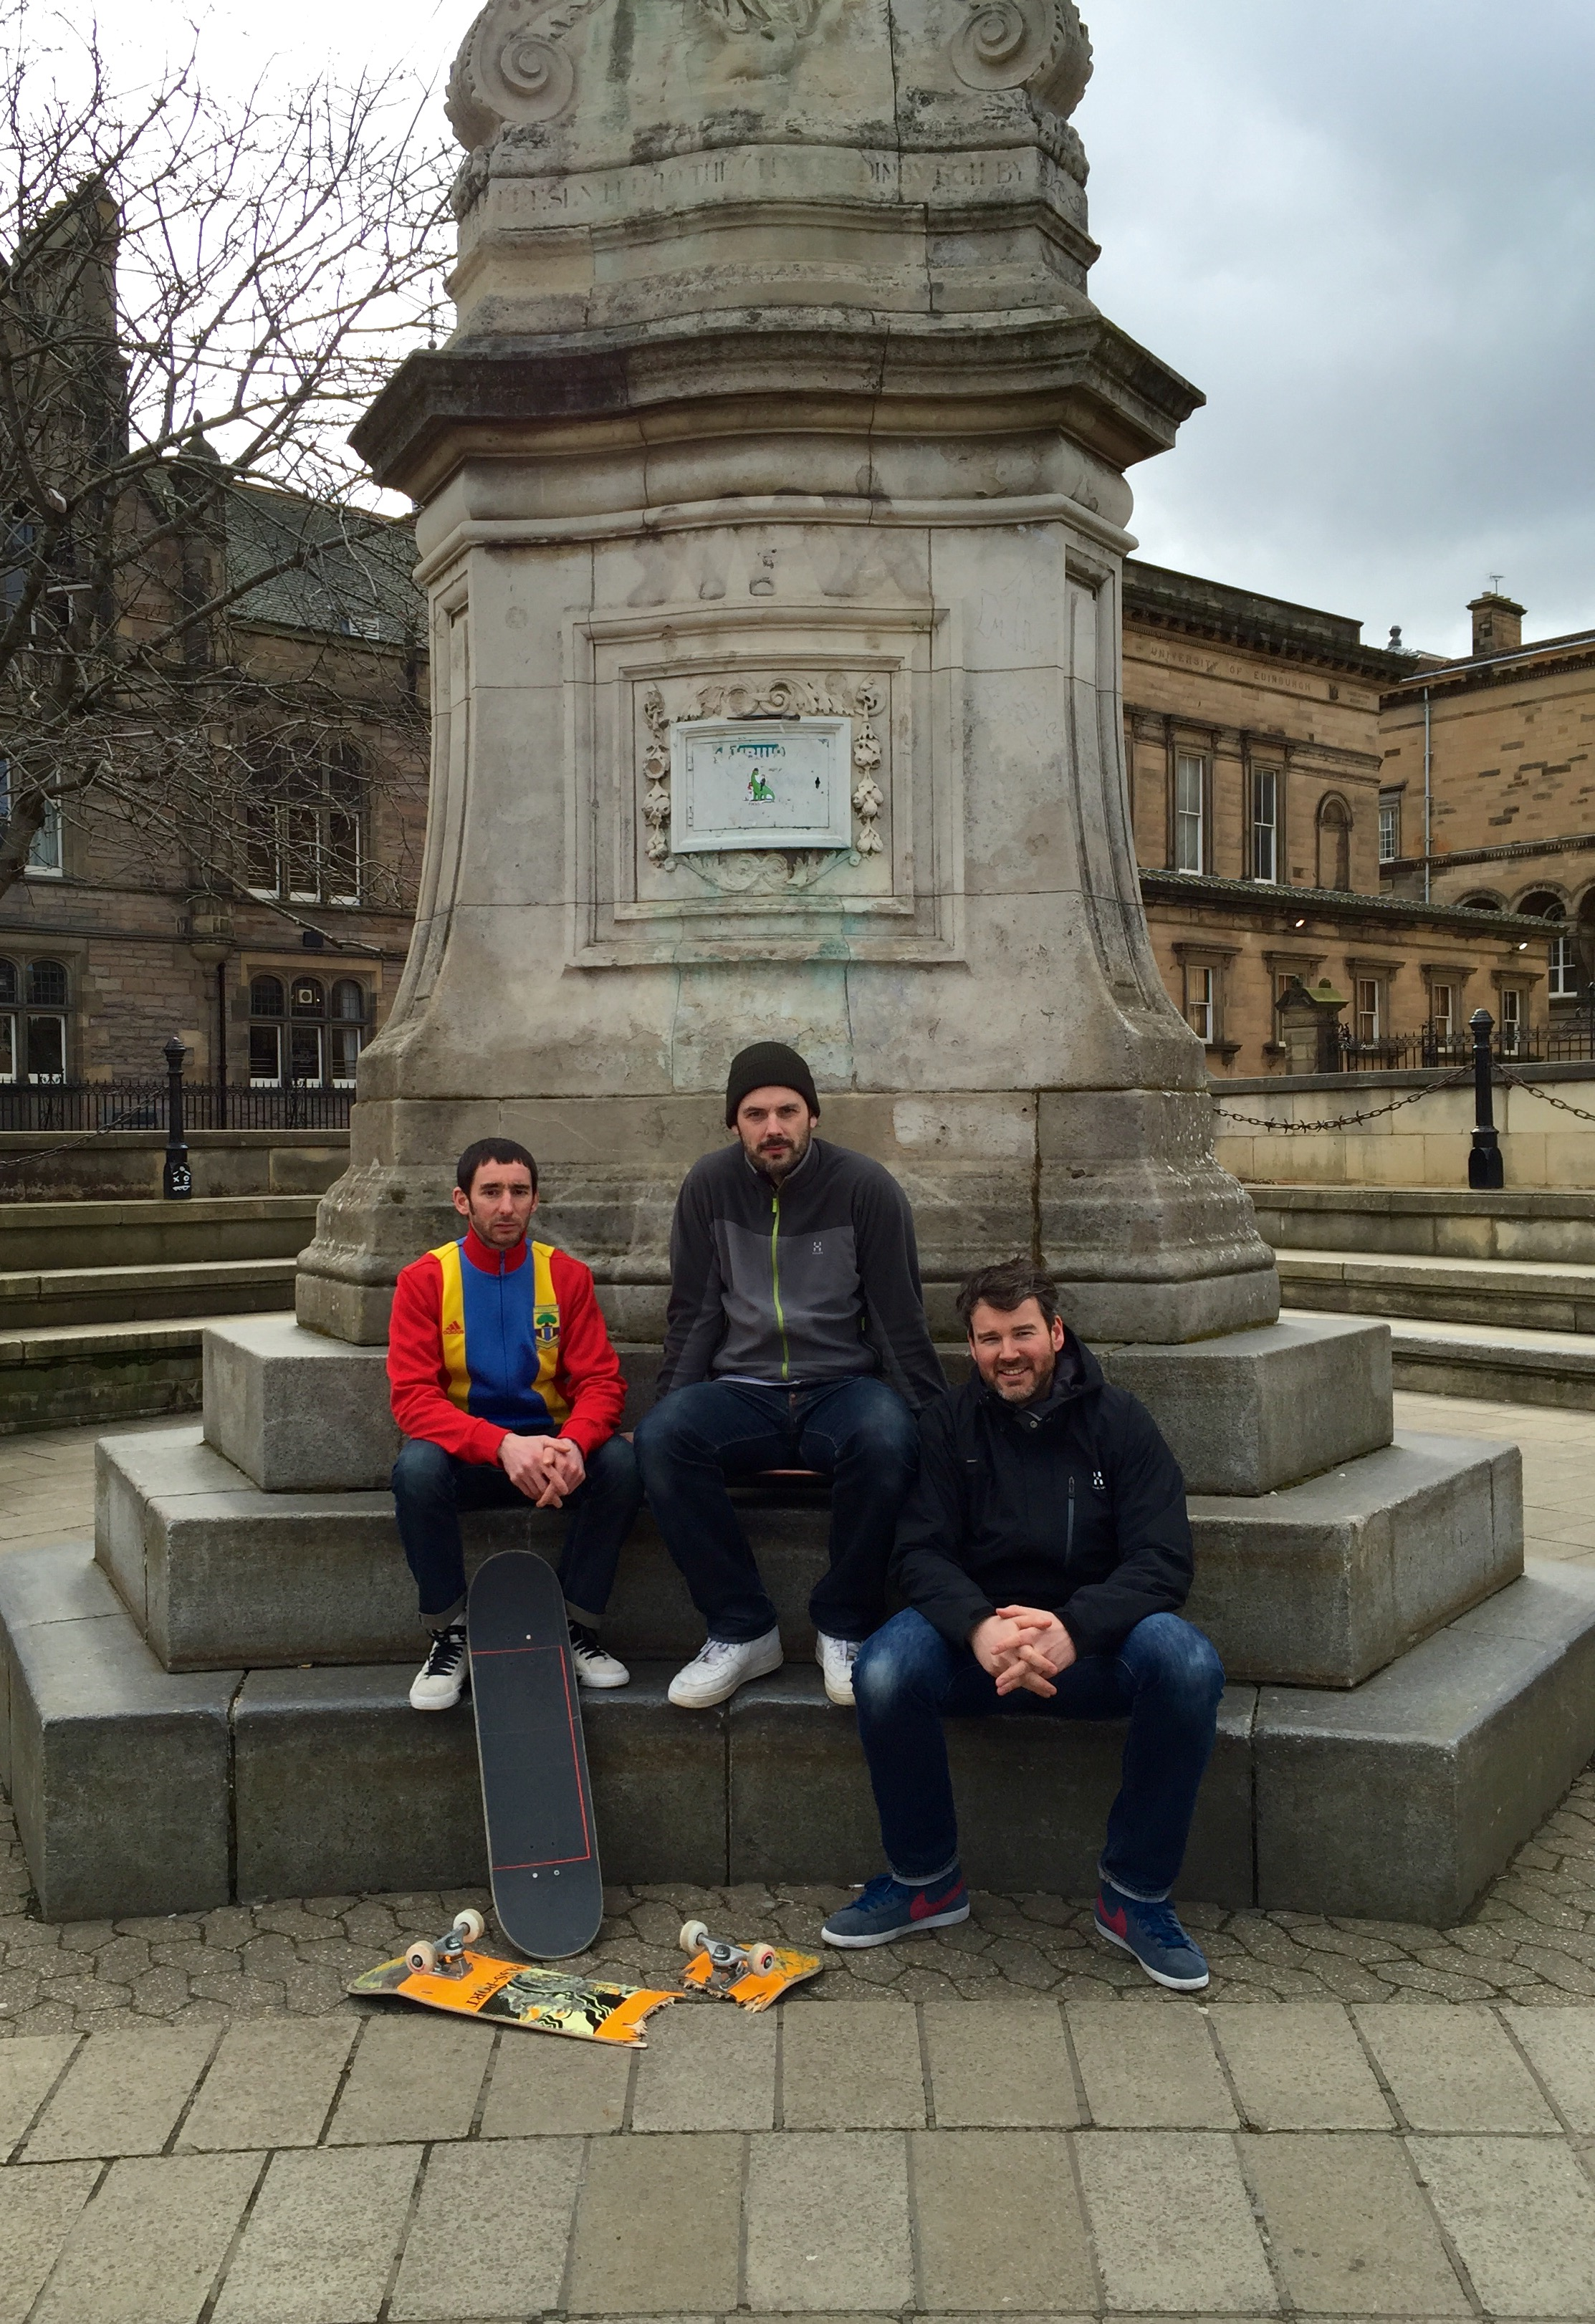 Rennie, Neil and Benjie: Bristo Square veterans